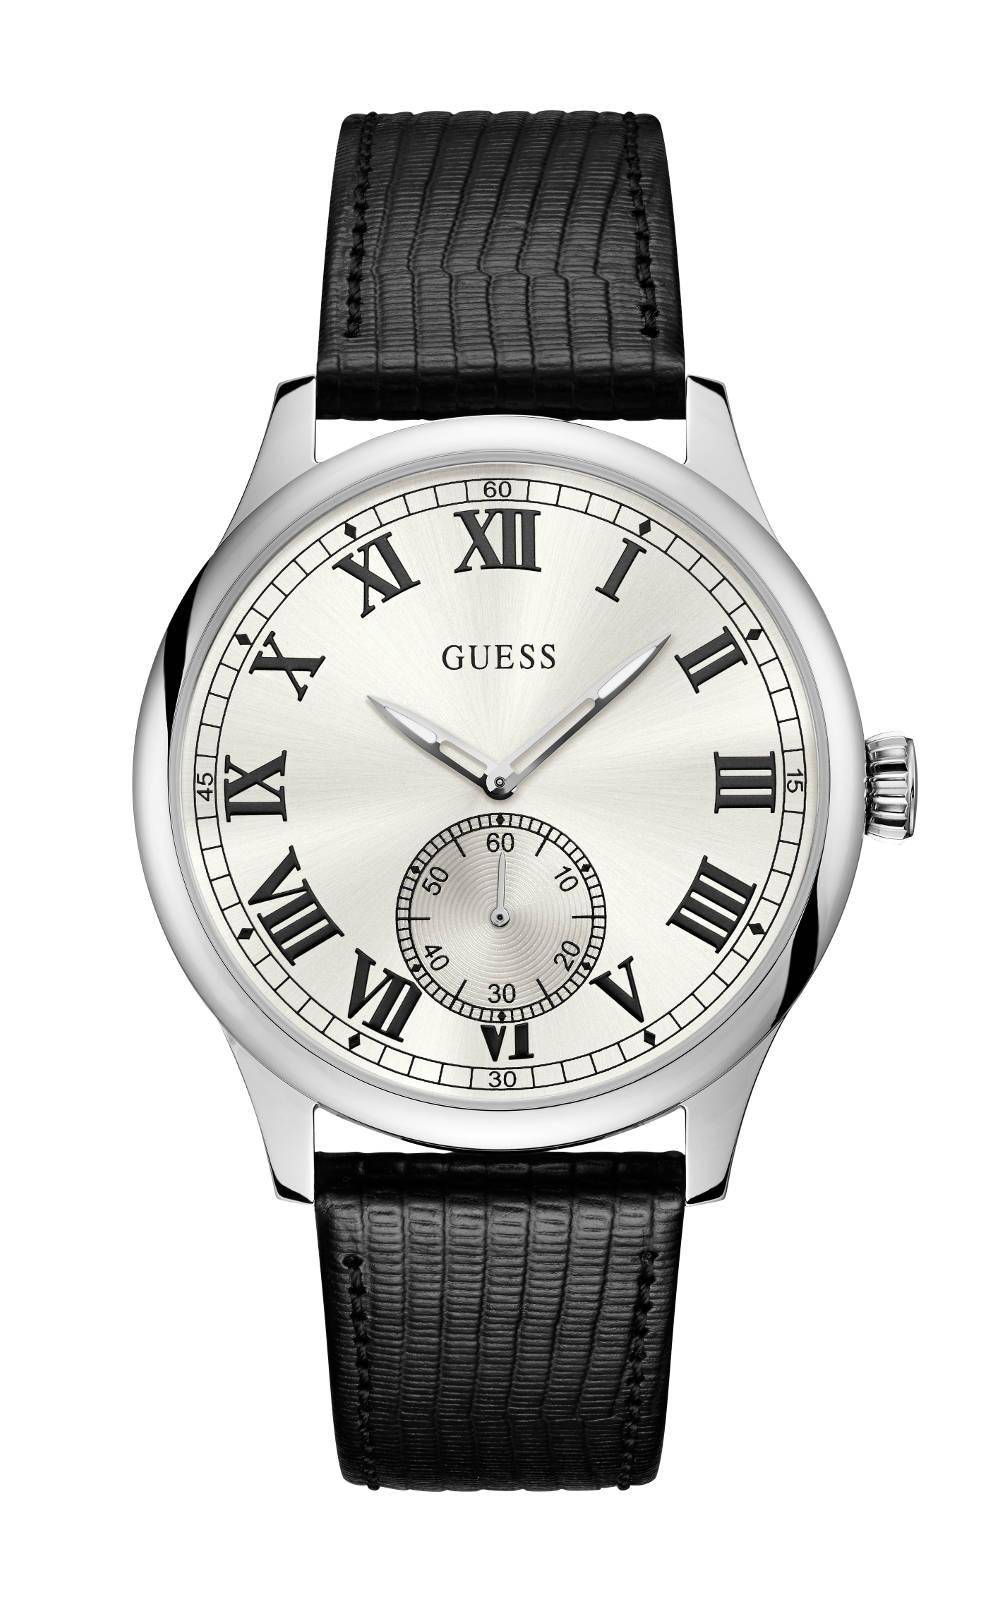 GUESS W1075G1 Ανδρικό Ρολόι Quartz Ακριβείας